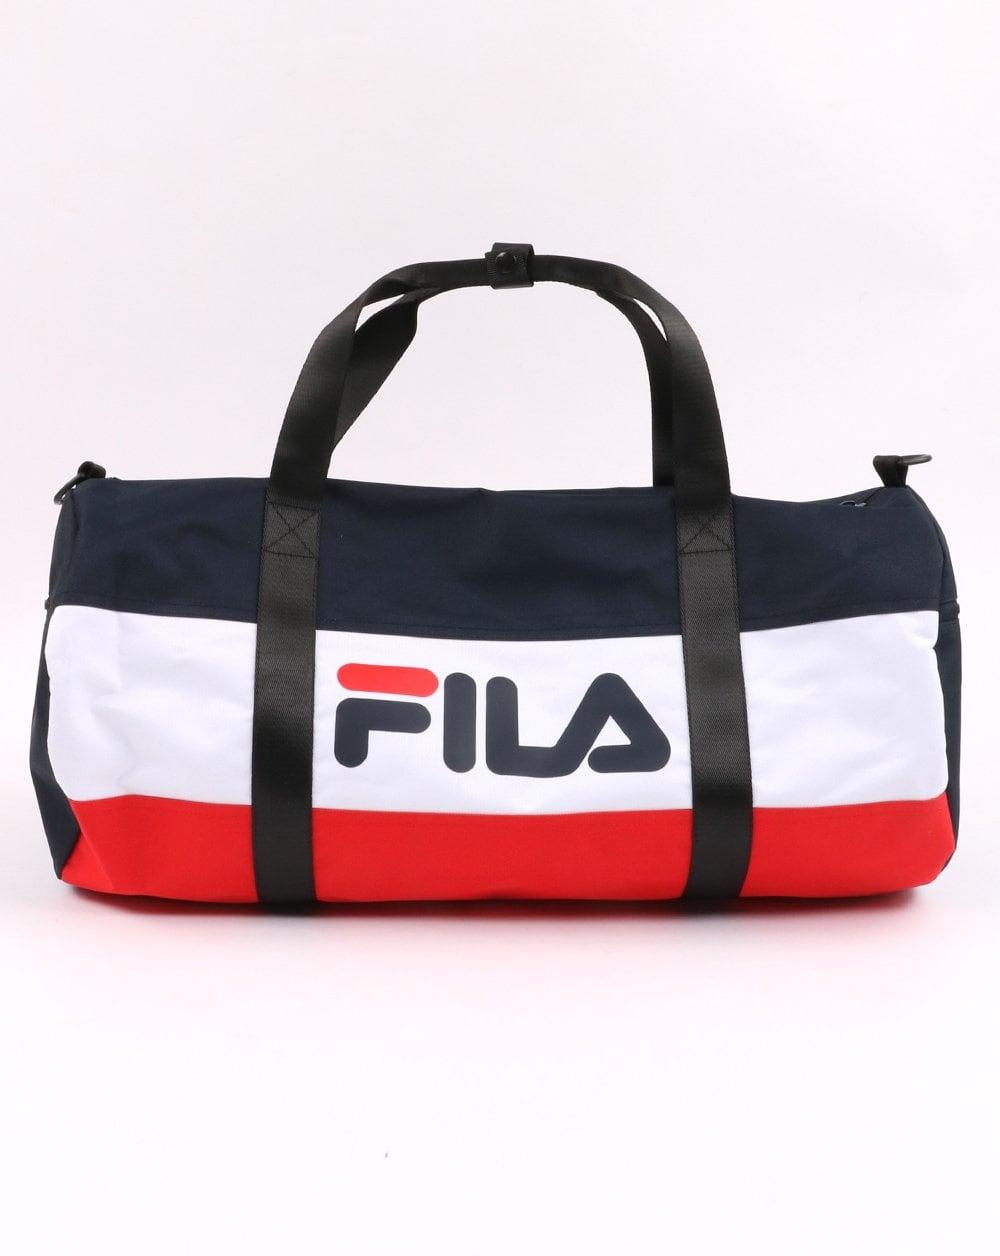 Fila Holdall Bag